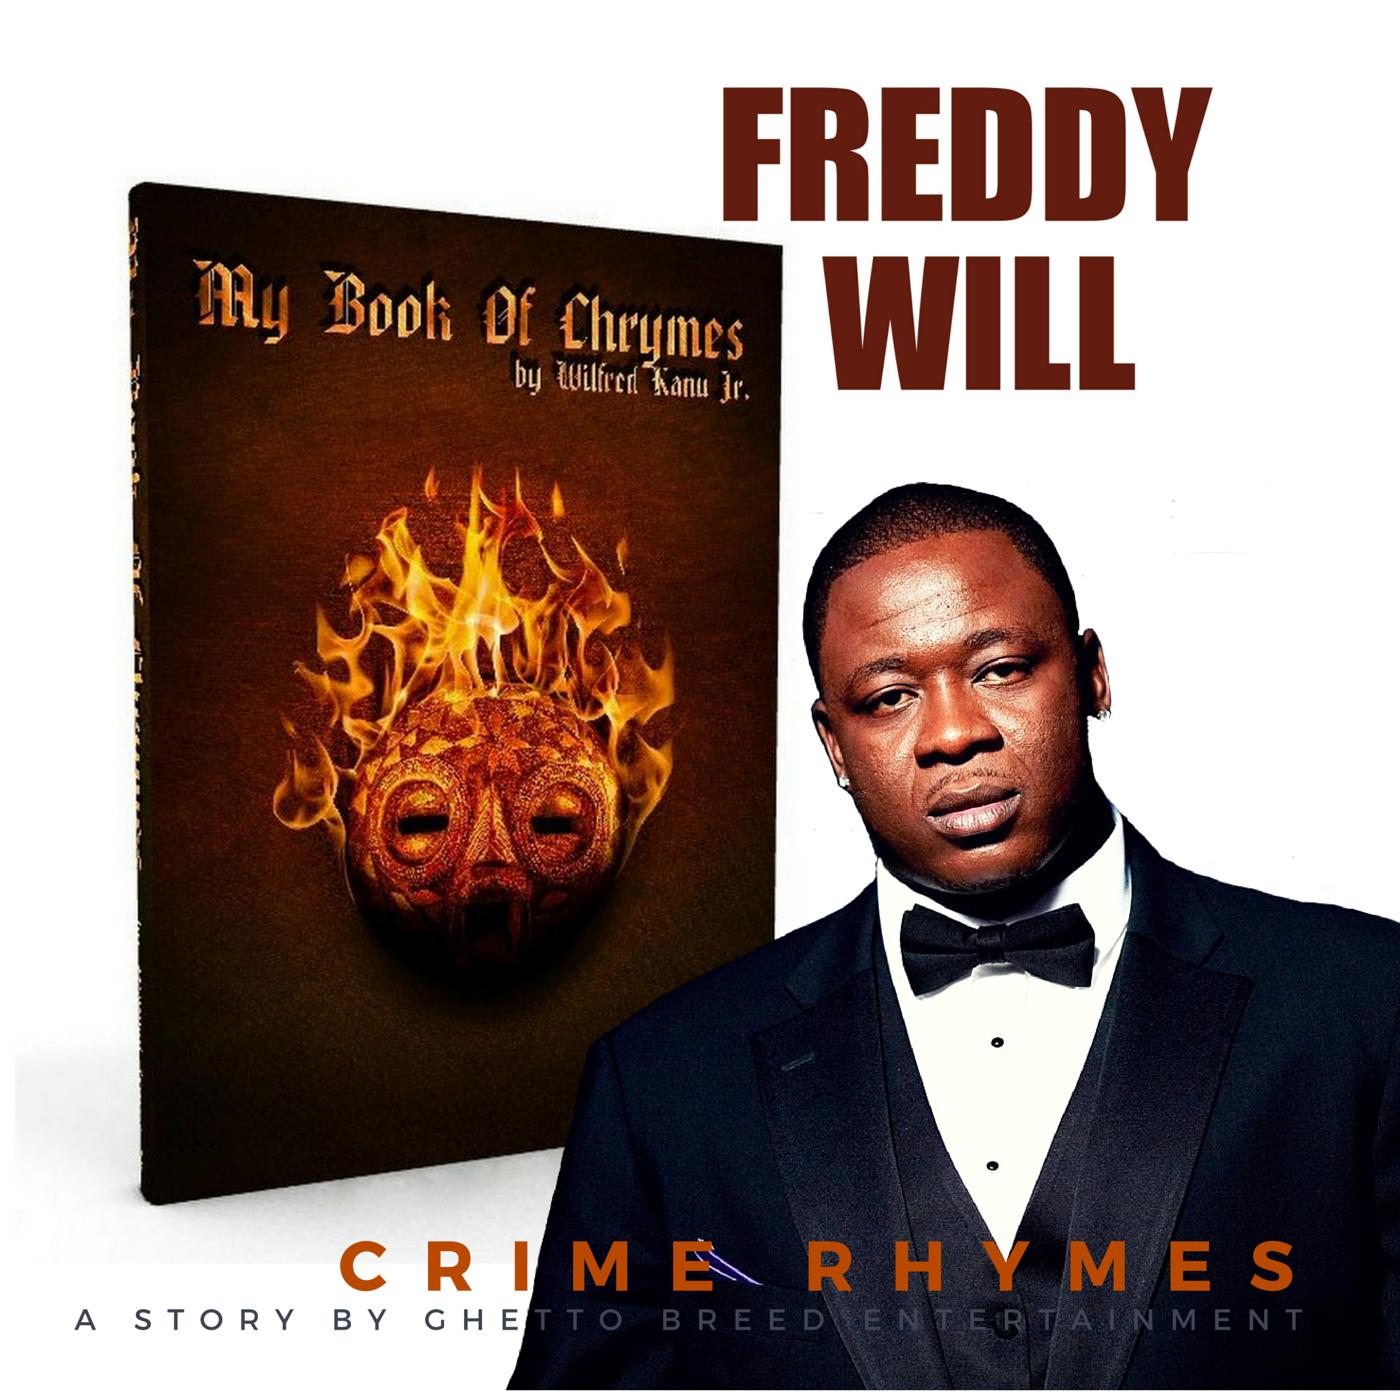 crime rhymes